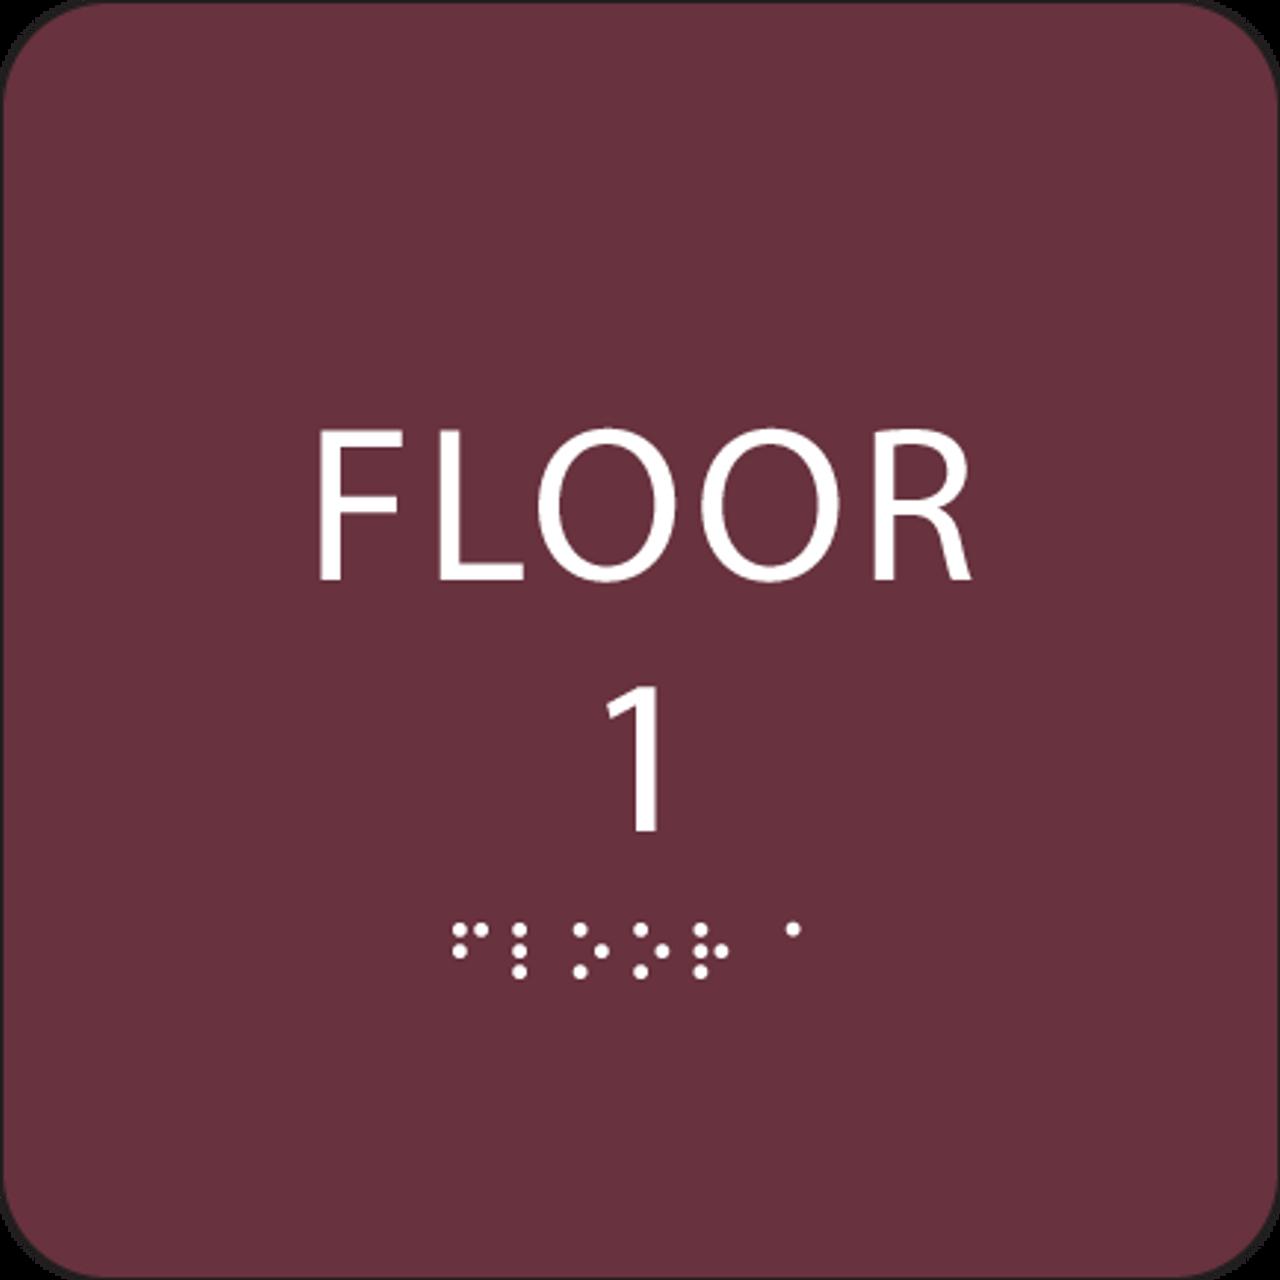 Burgundy Floor 1 Identification Sign